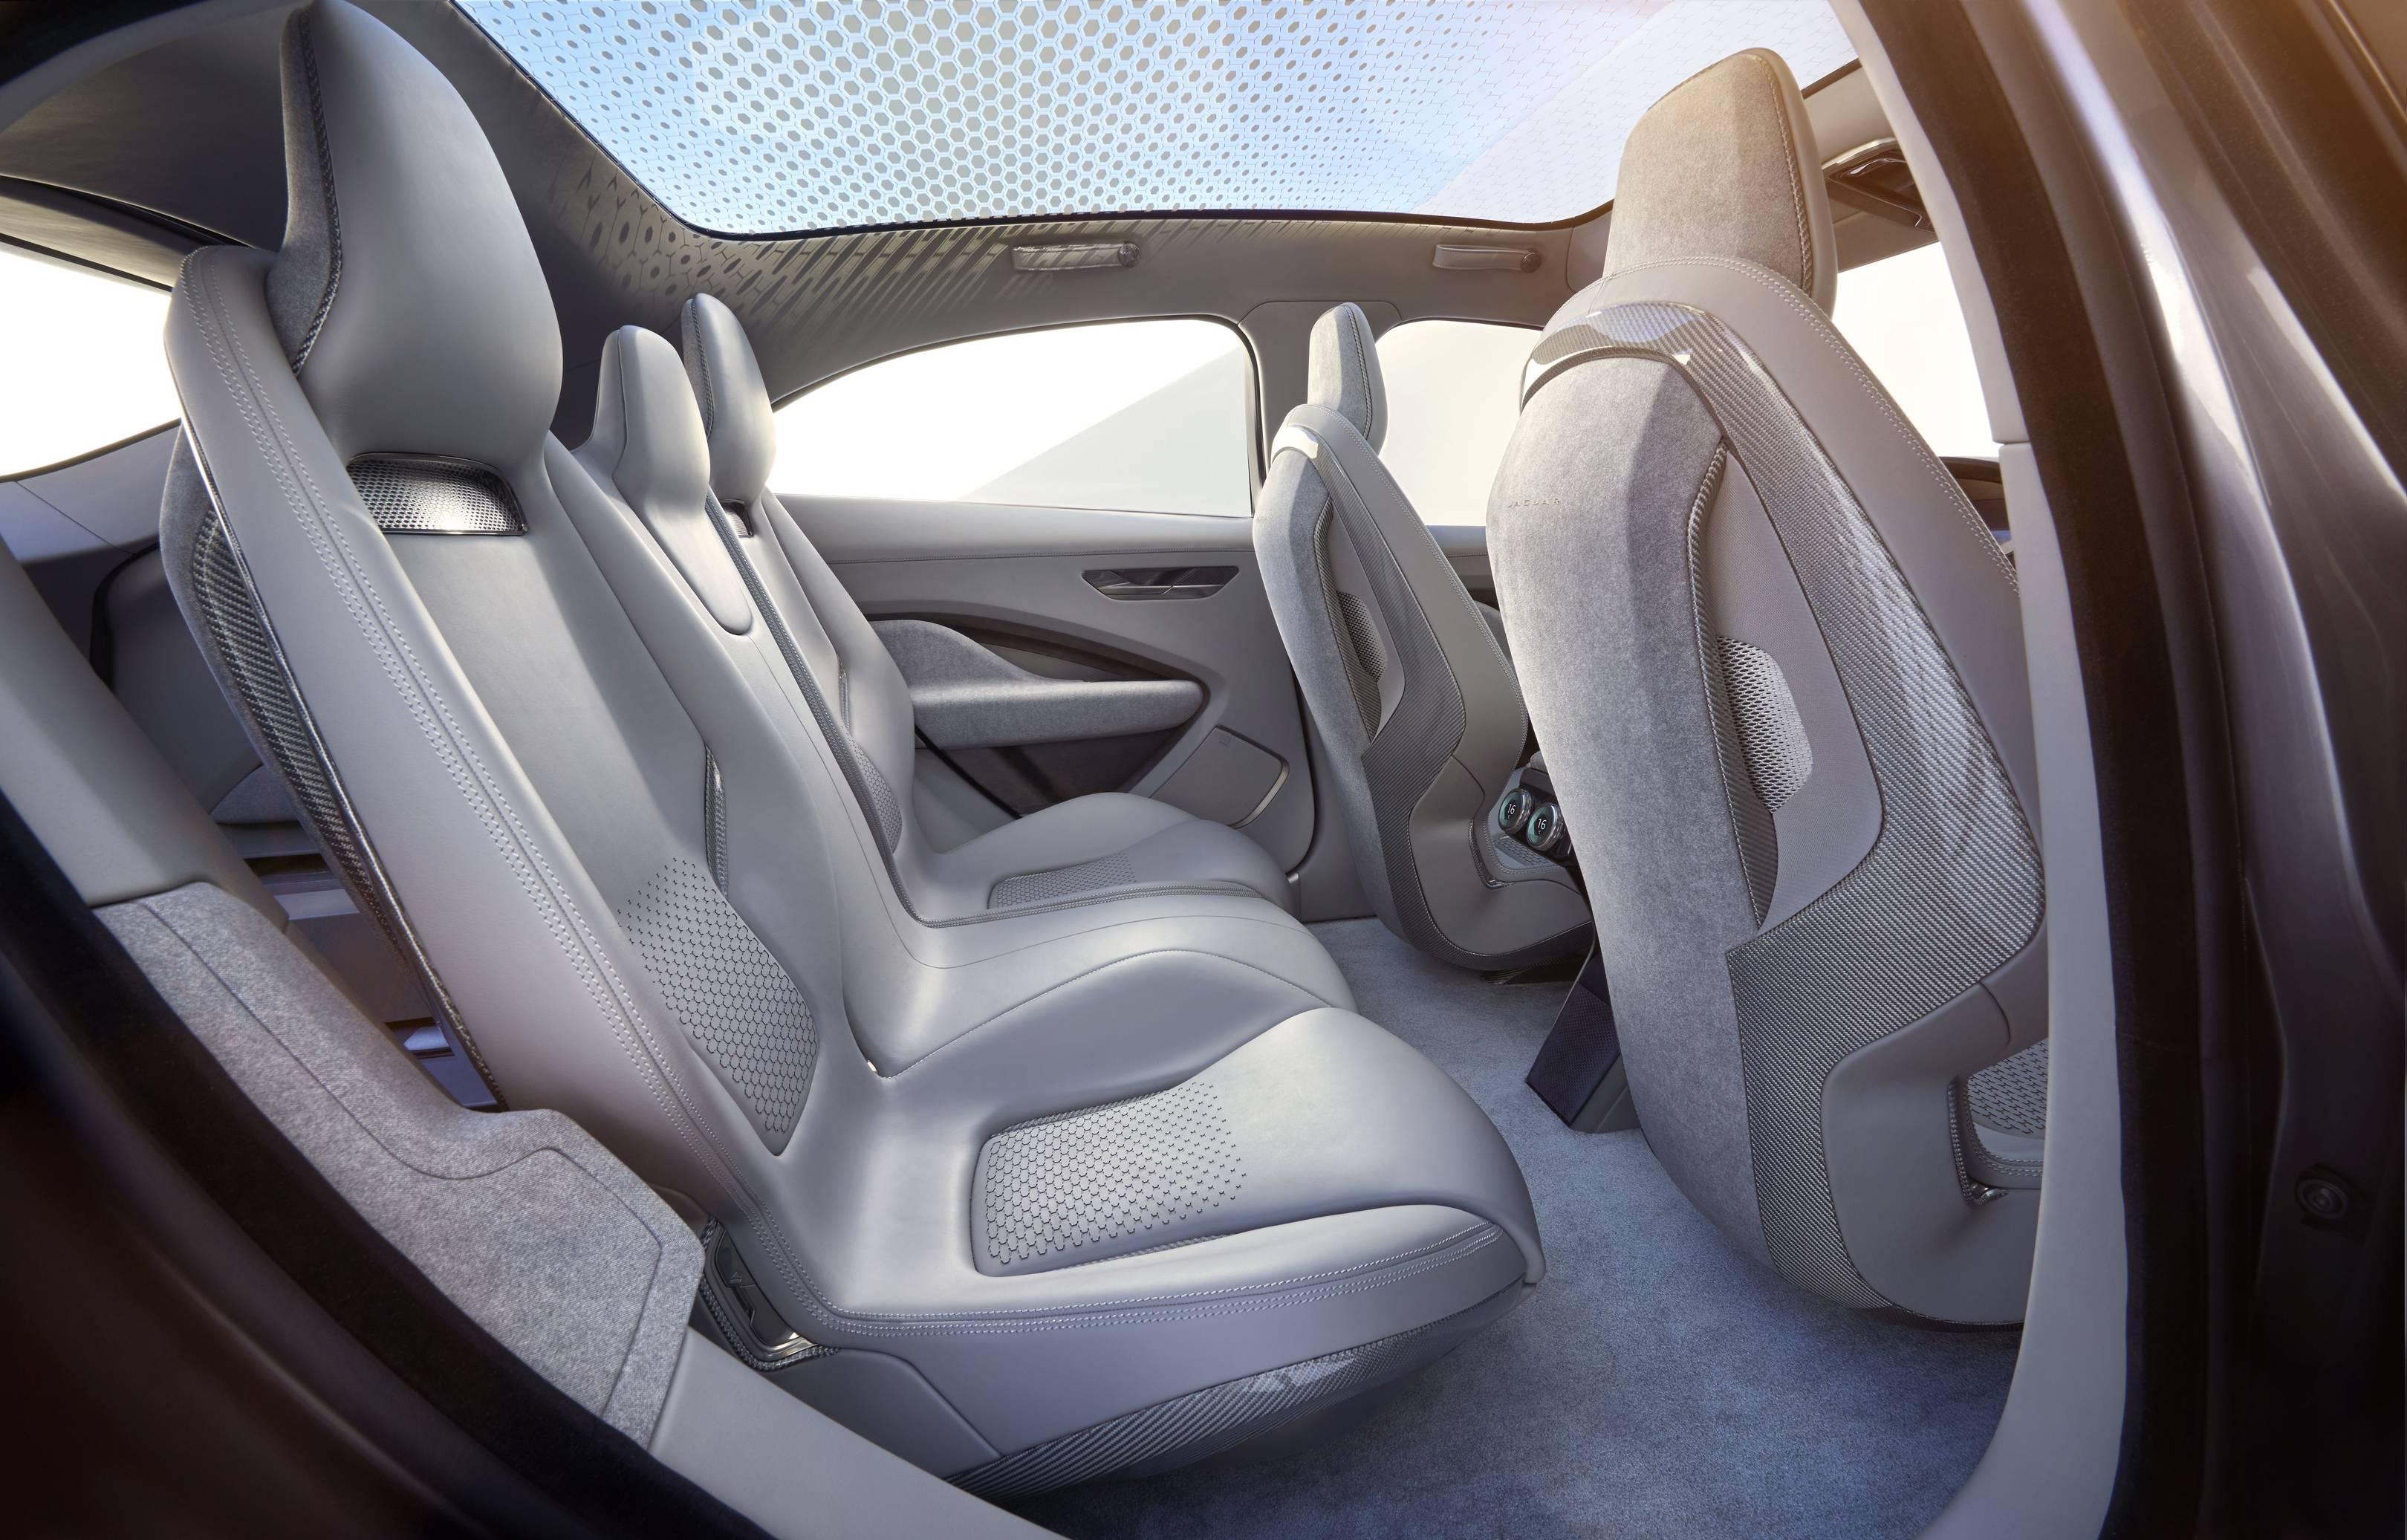 Jaguar Suv Interior Photos